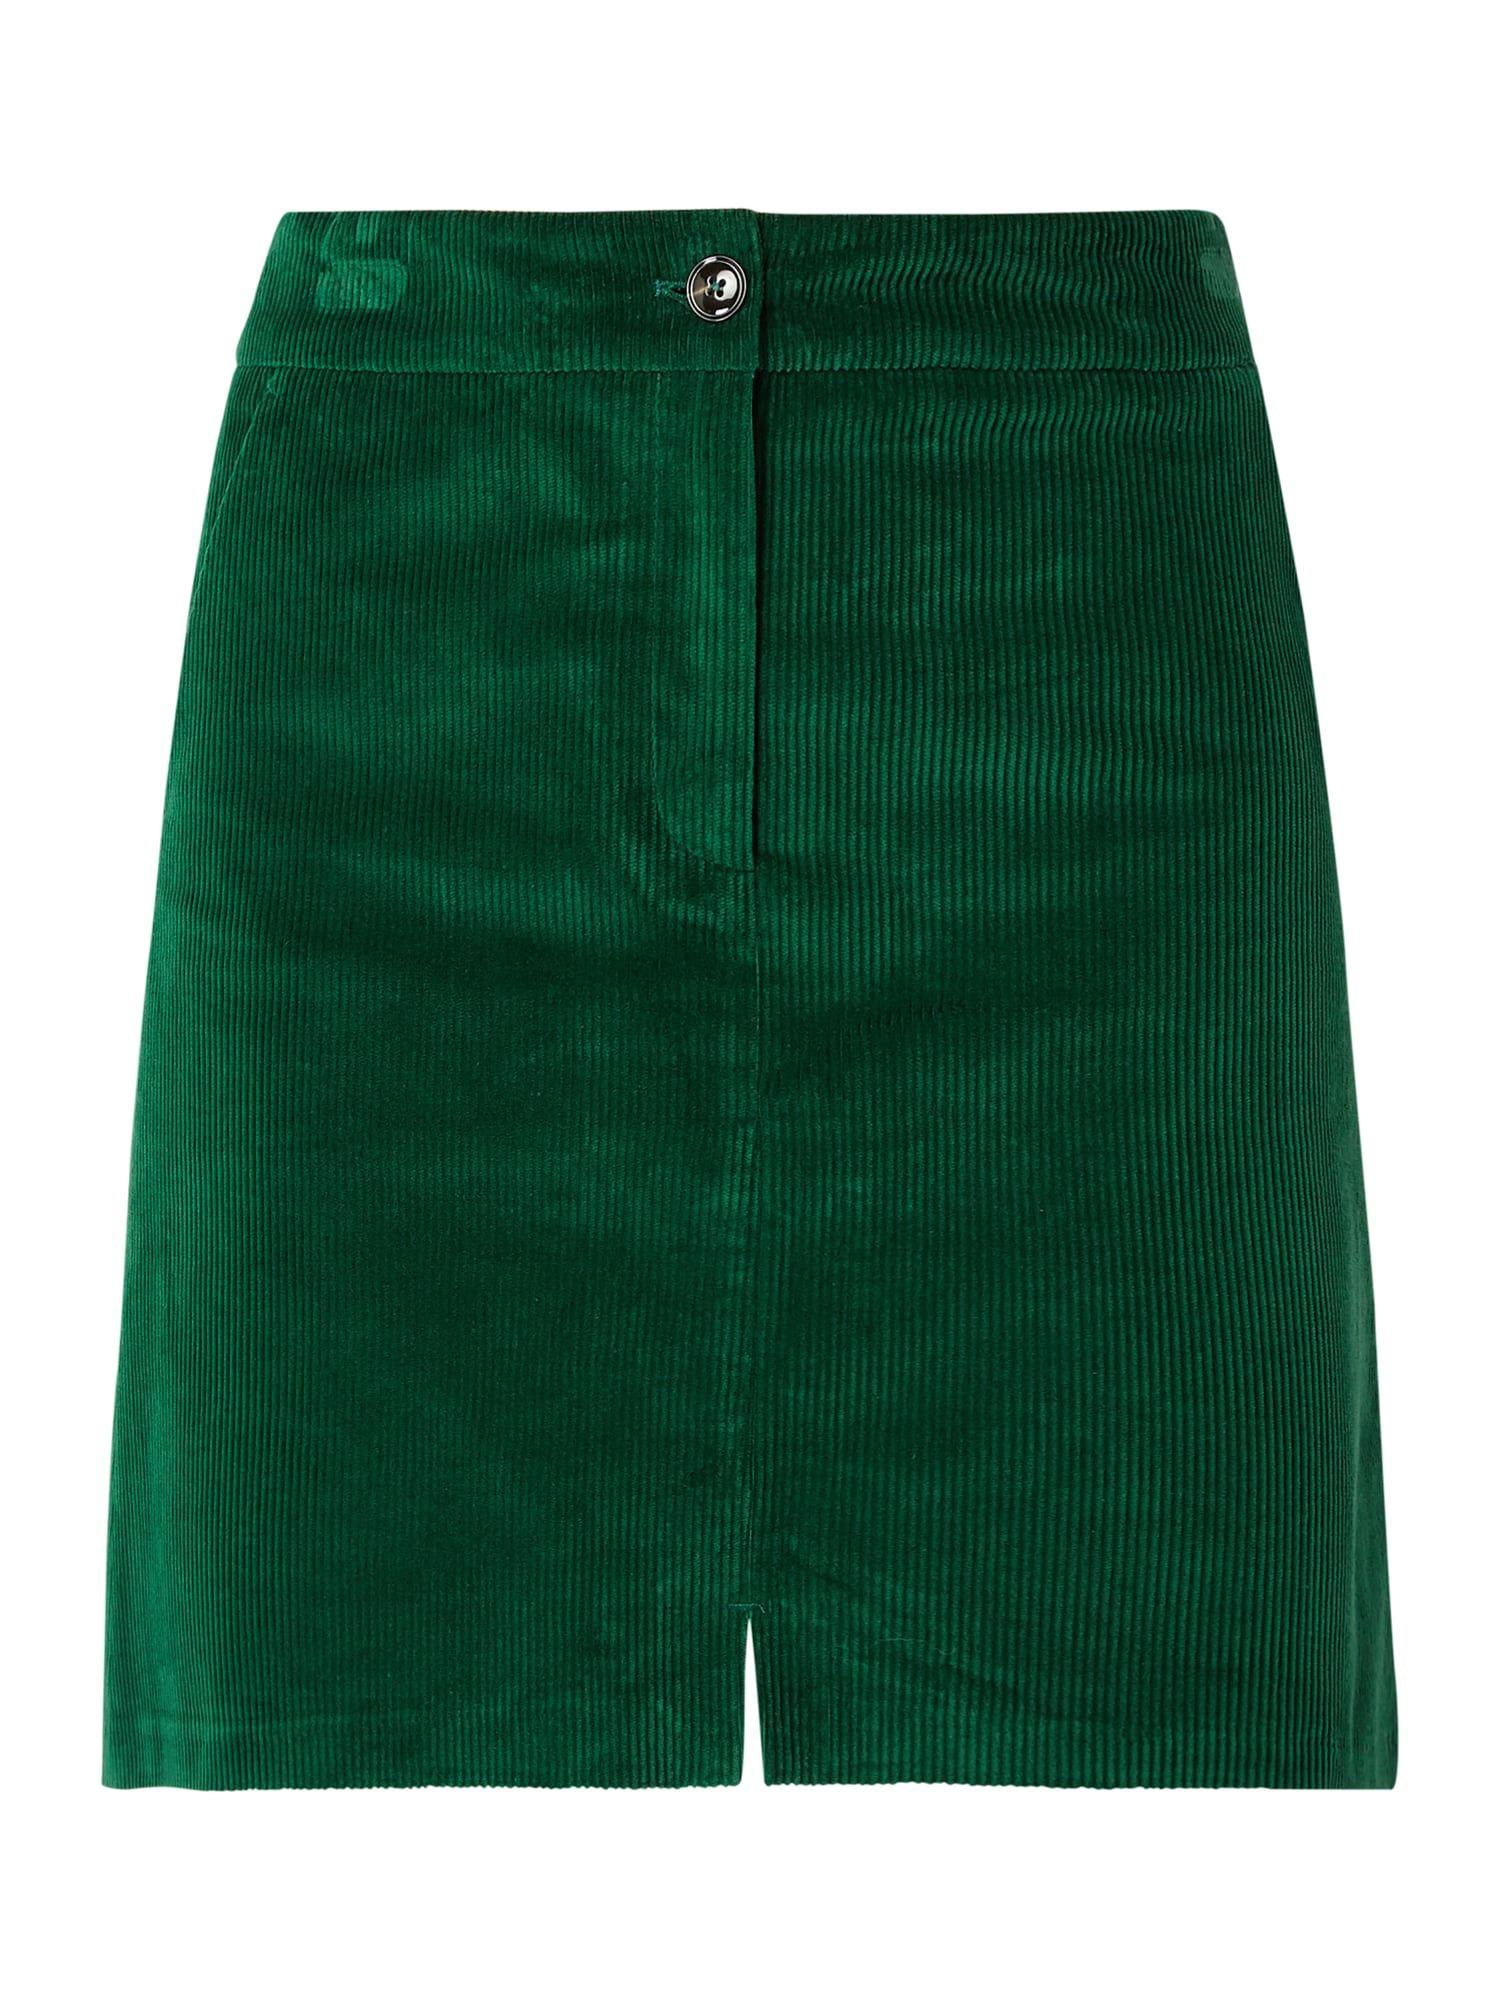 7590a20930 Bei ➧ P&C Mini-röcke von MARC-O-POLO ✓ Jetzt MARC-O-POLO Minirock aus Cord  in Grün online kaufen ✓ 9855028